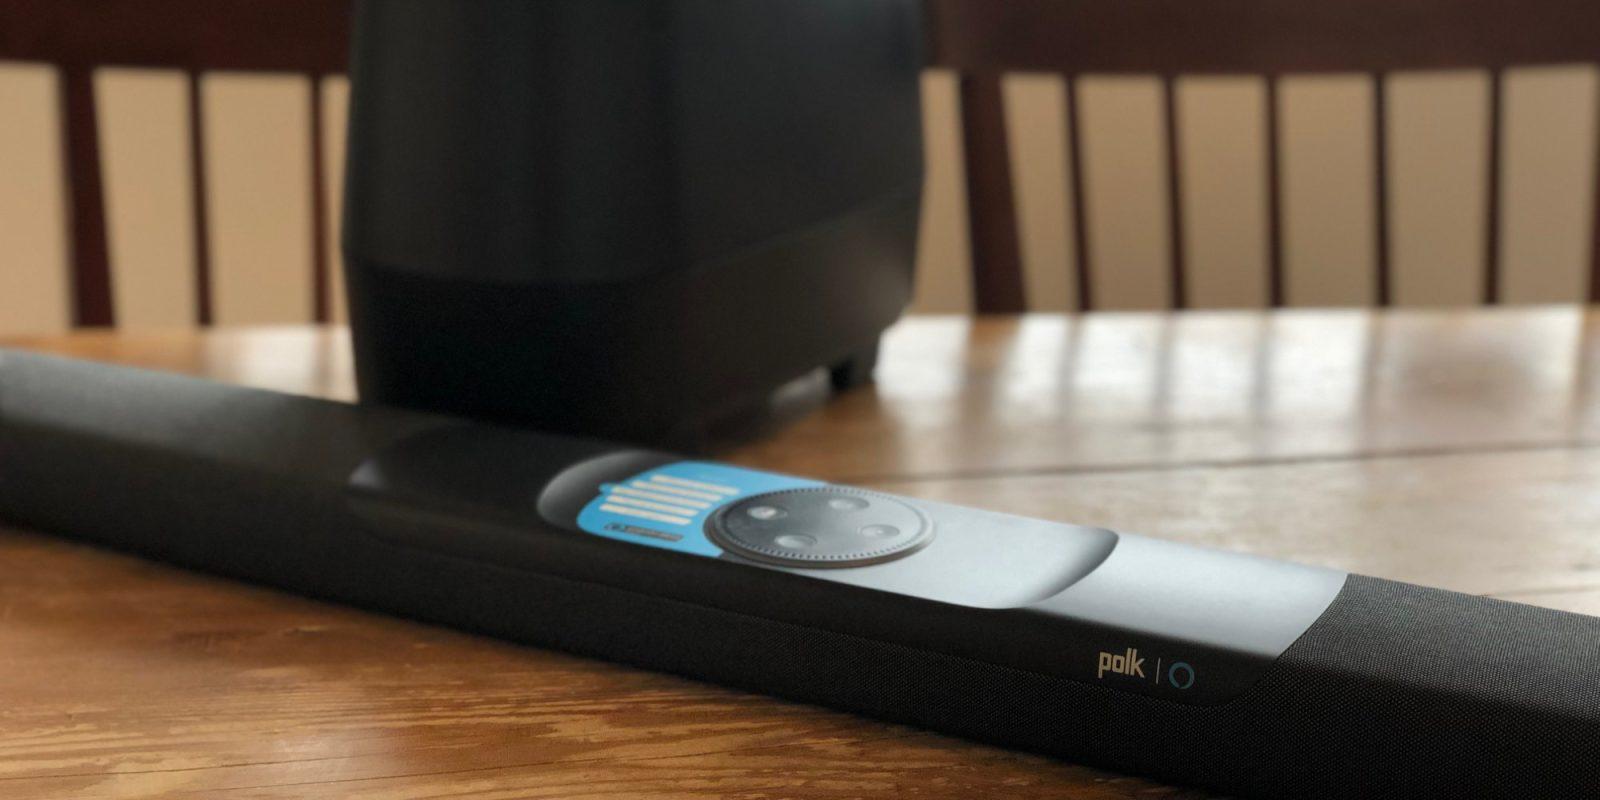 Polk Command Sound Bar has Alexa + multi-room music support: $239 (Save 20%)